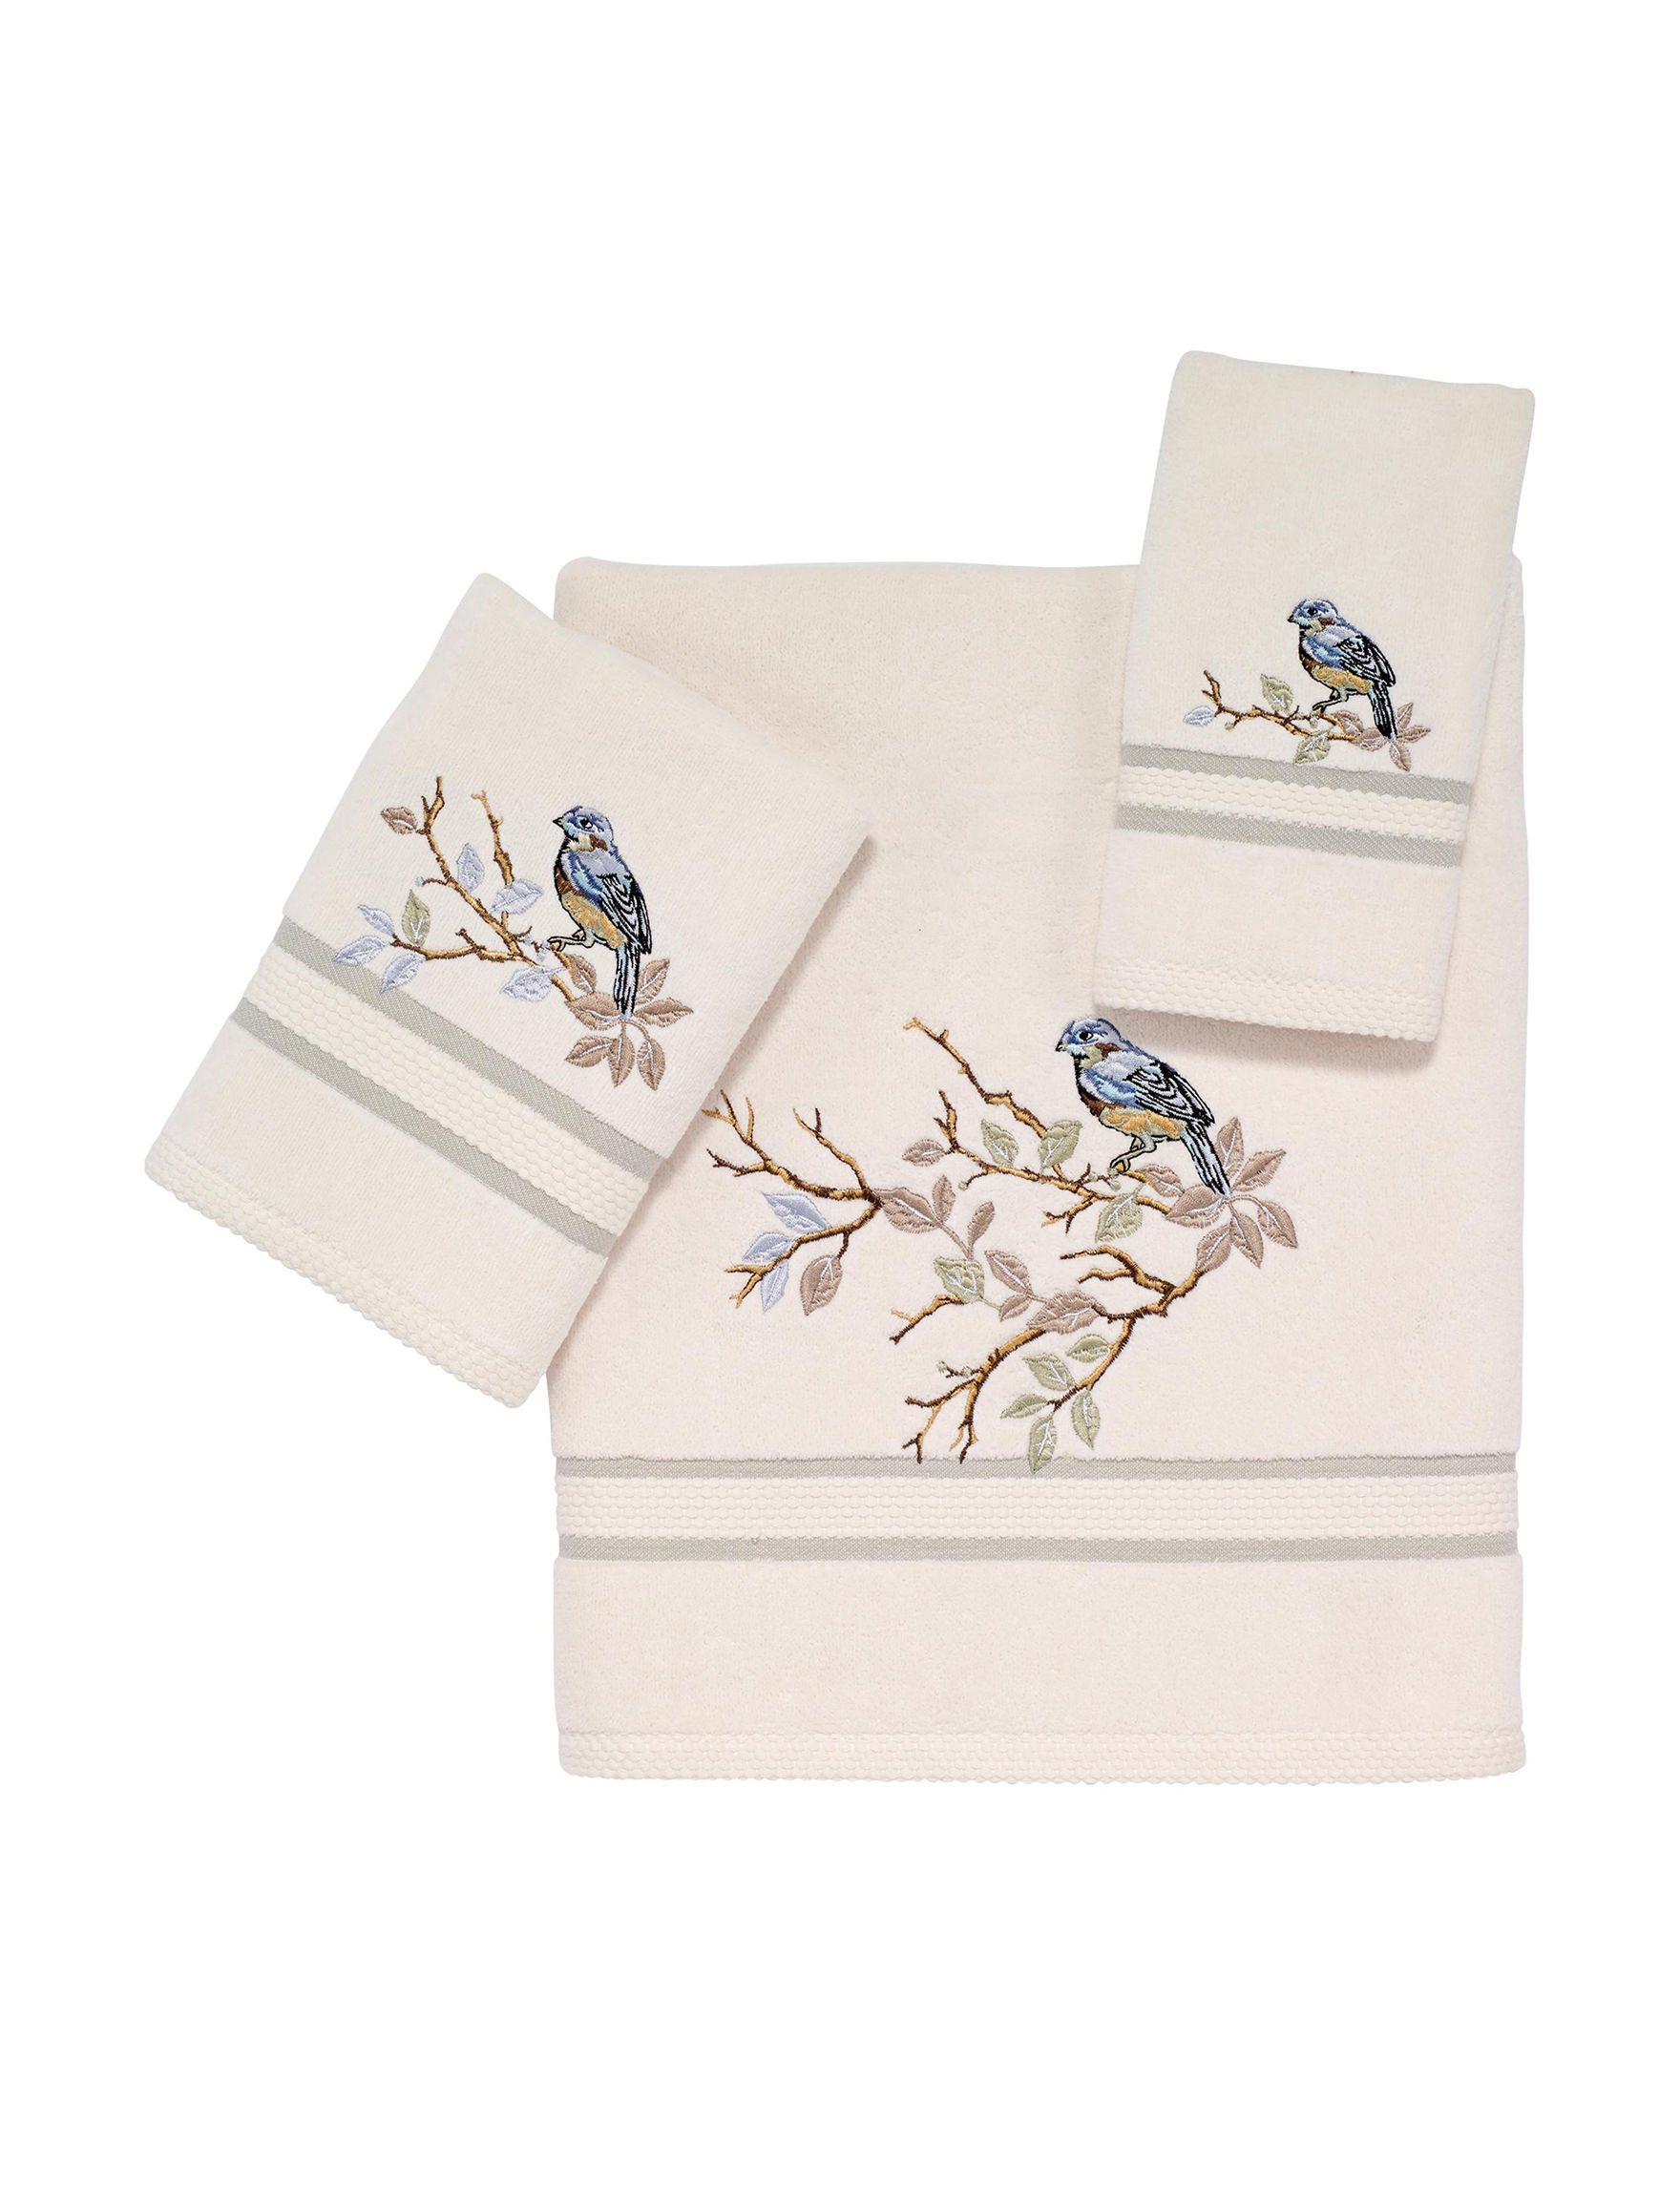 Avanti Beige / Blue Towel Sets Towels